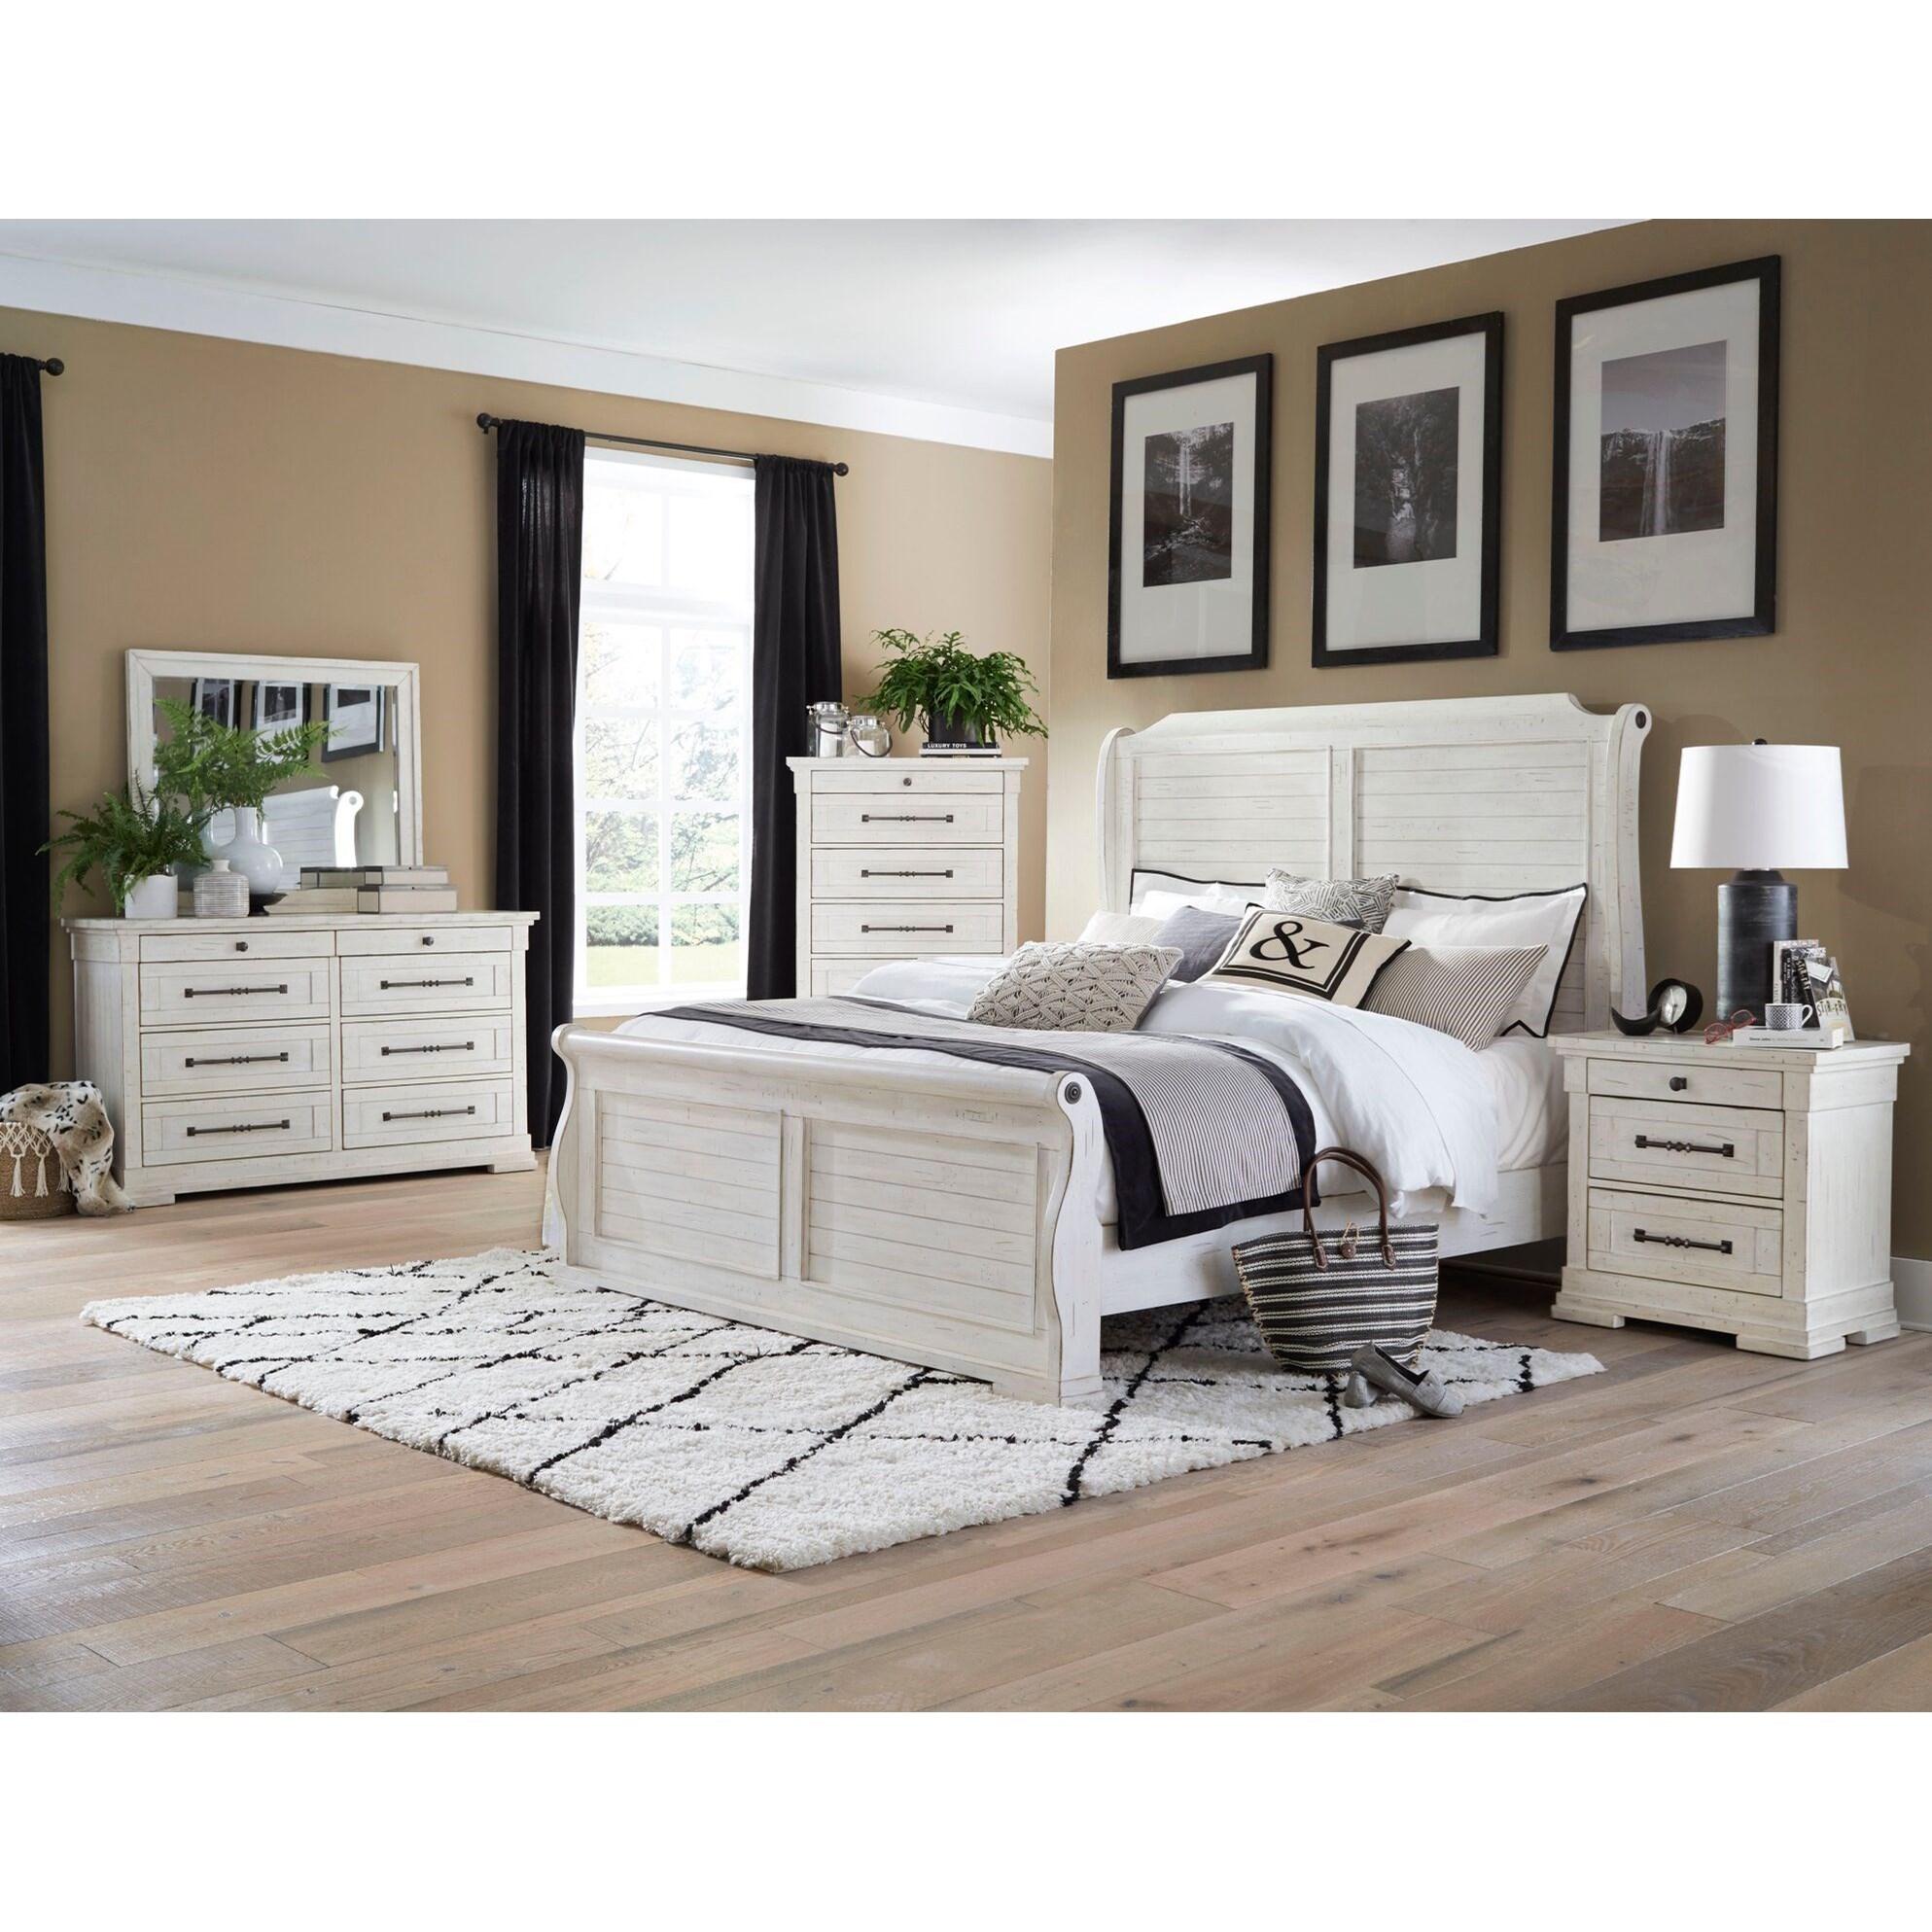 - Lifestyle C8047A QS0-QSG-BSN+045+050+025 Queen Sleigh Bed, Dresser